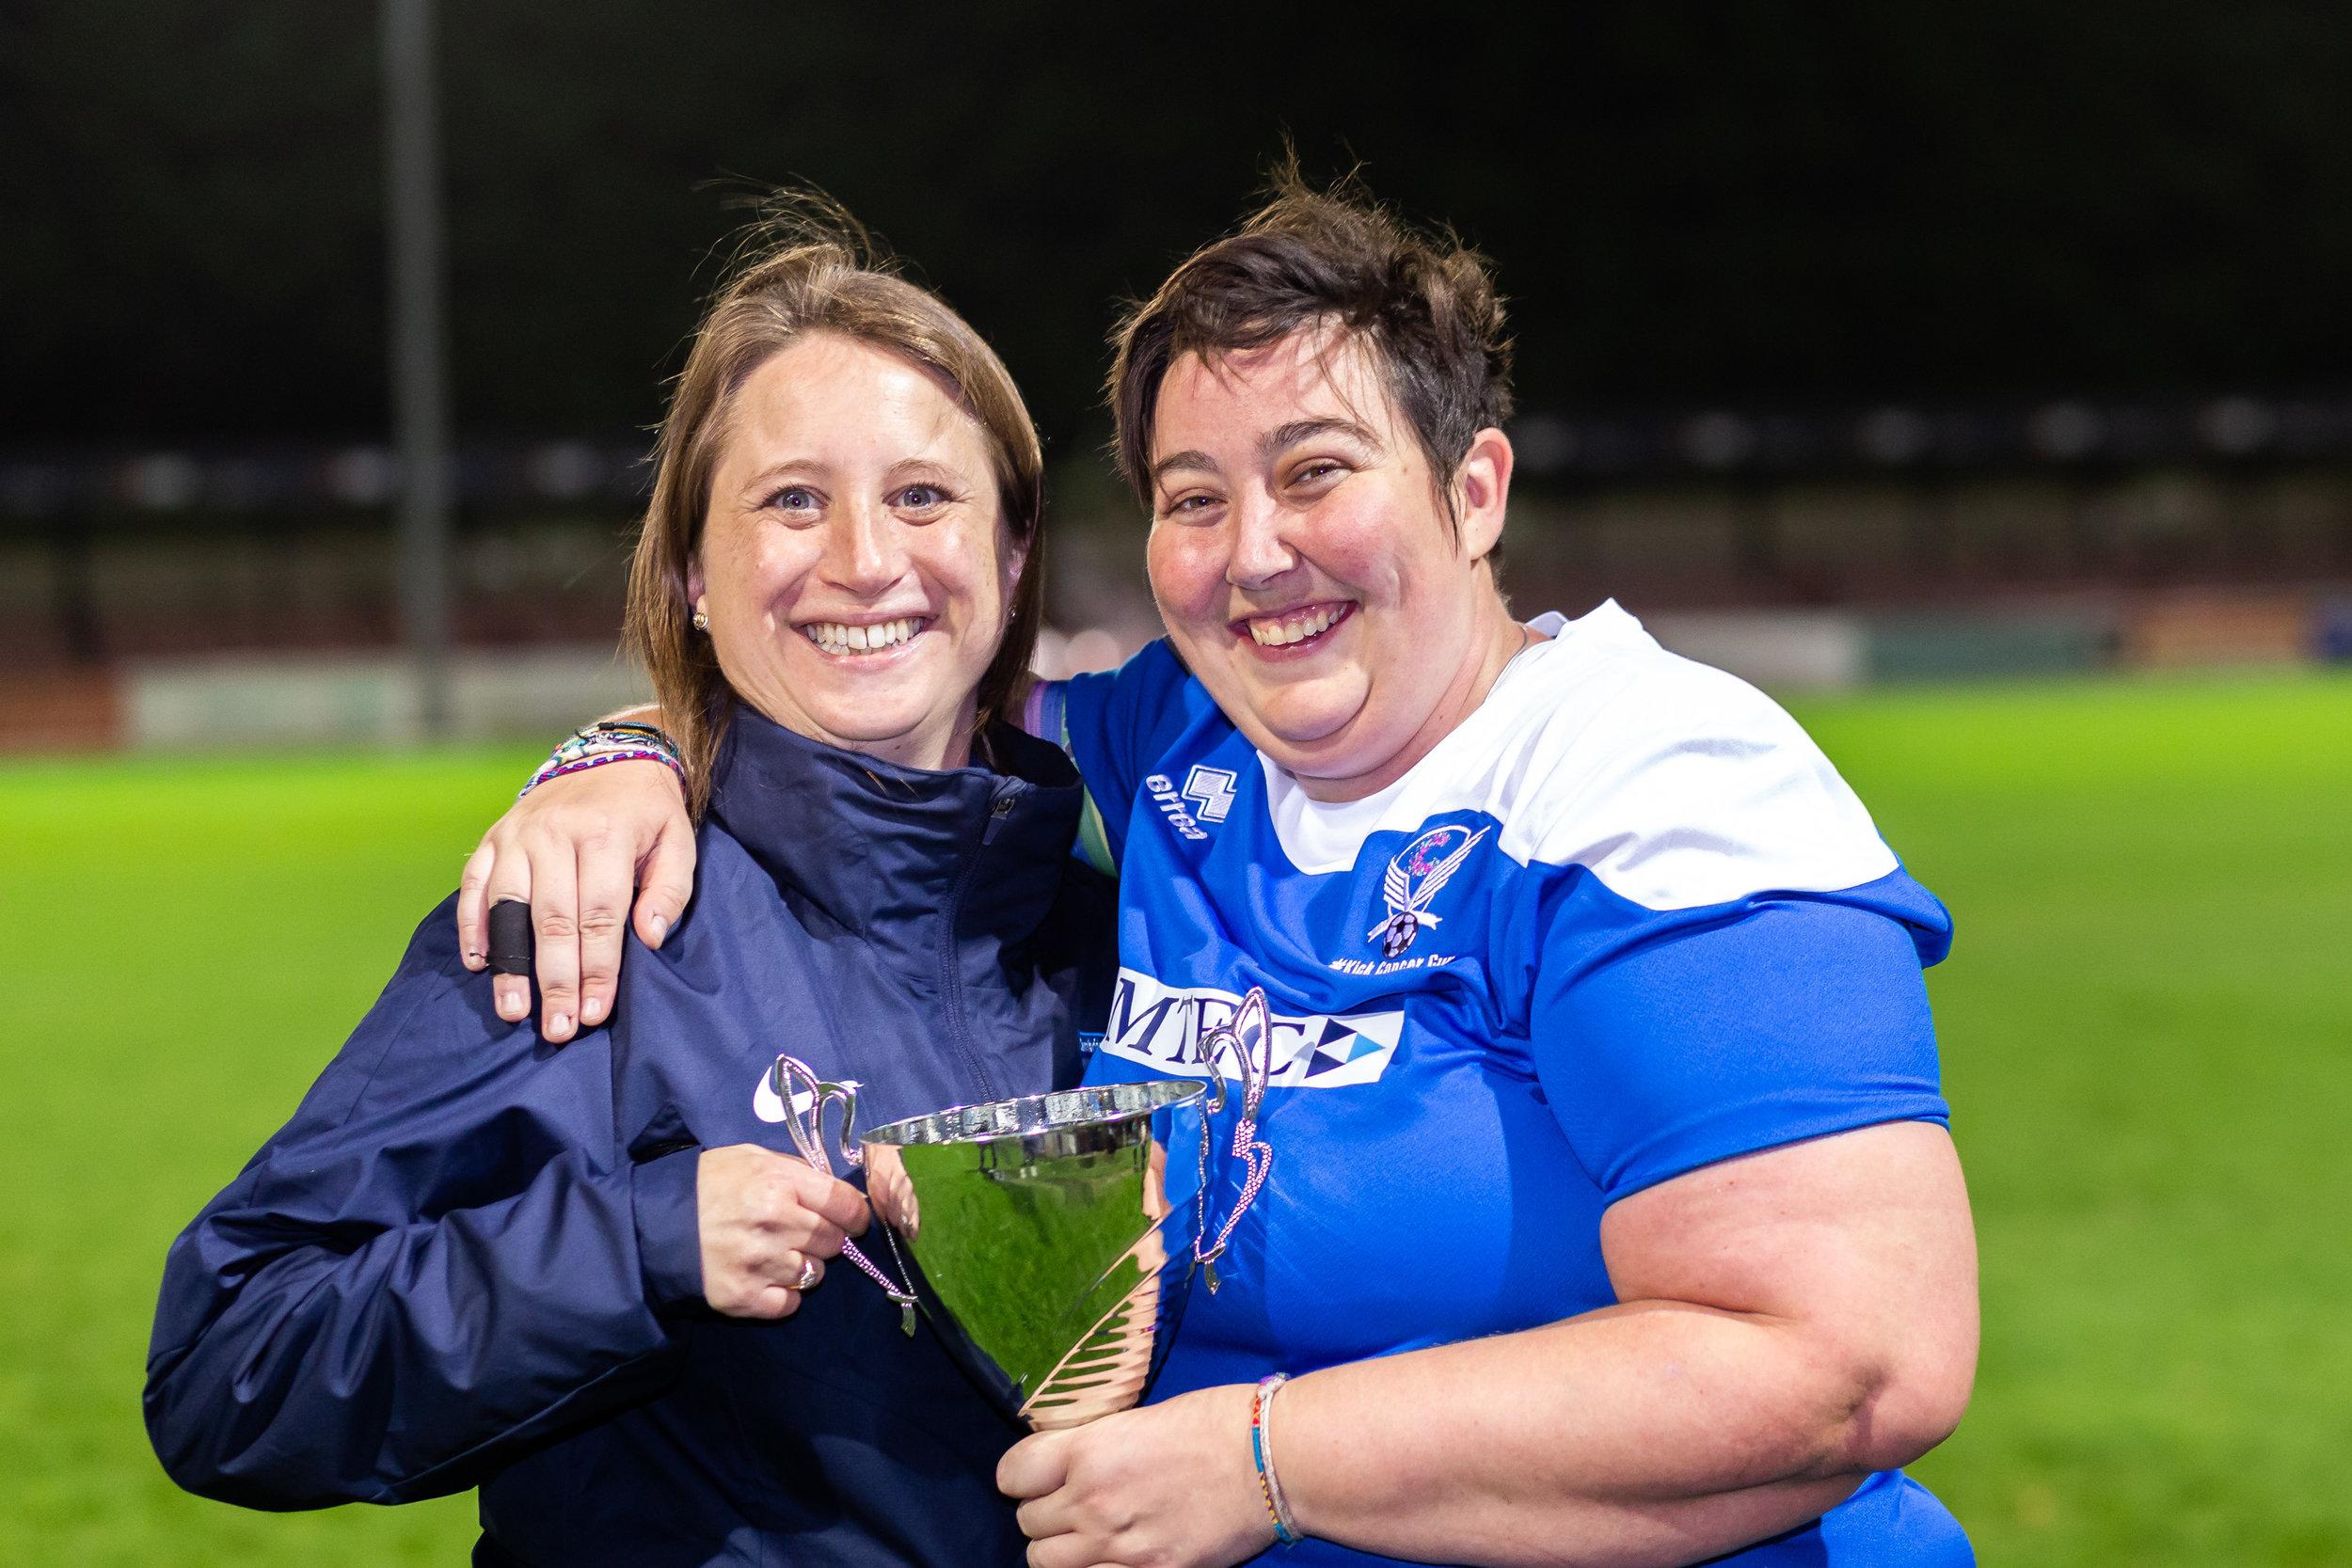 KICK CANCER CUP 2019 CAMBRIDGE